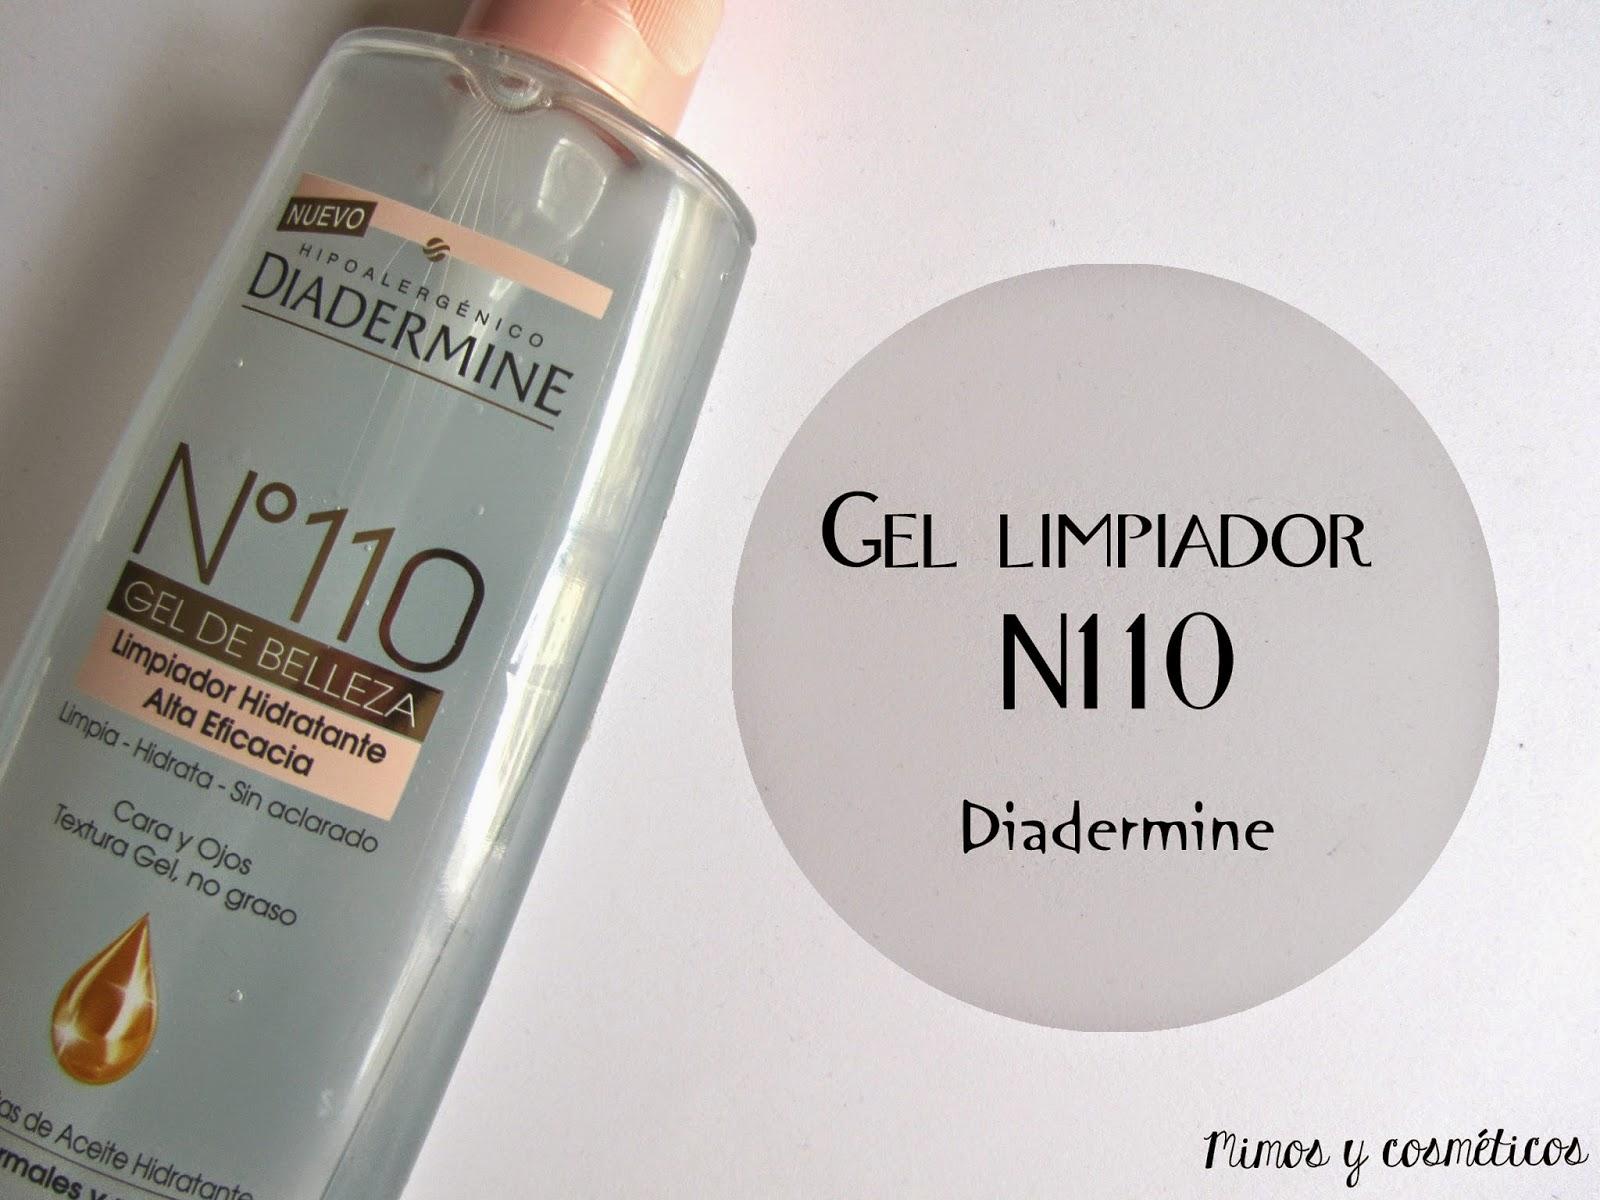 Diadermine 110